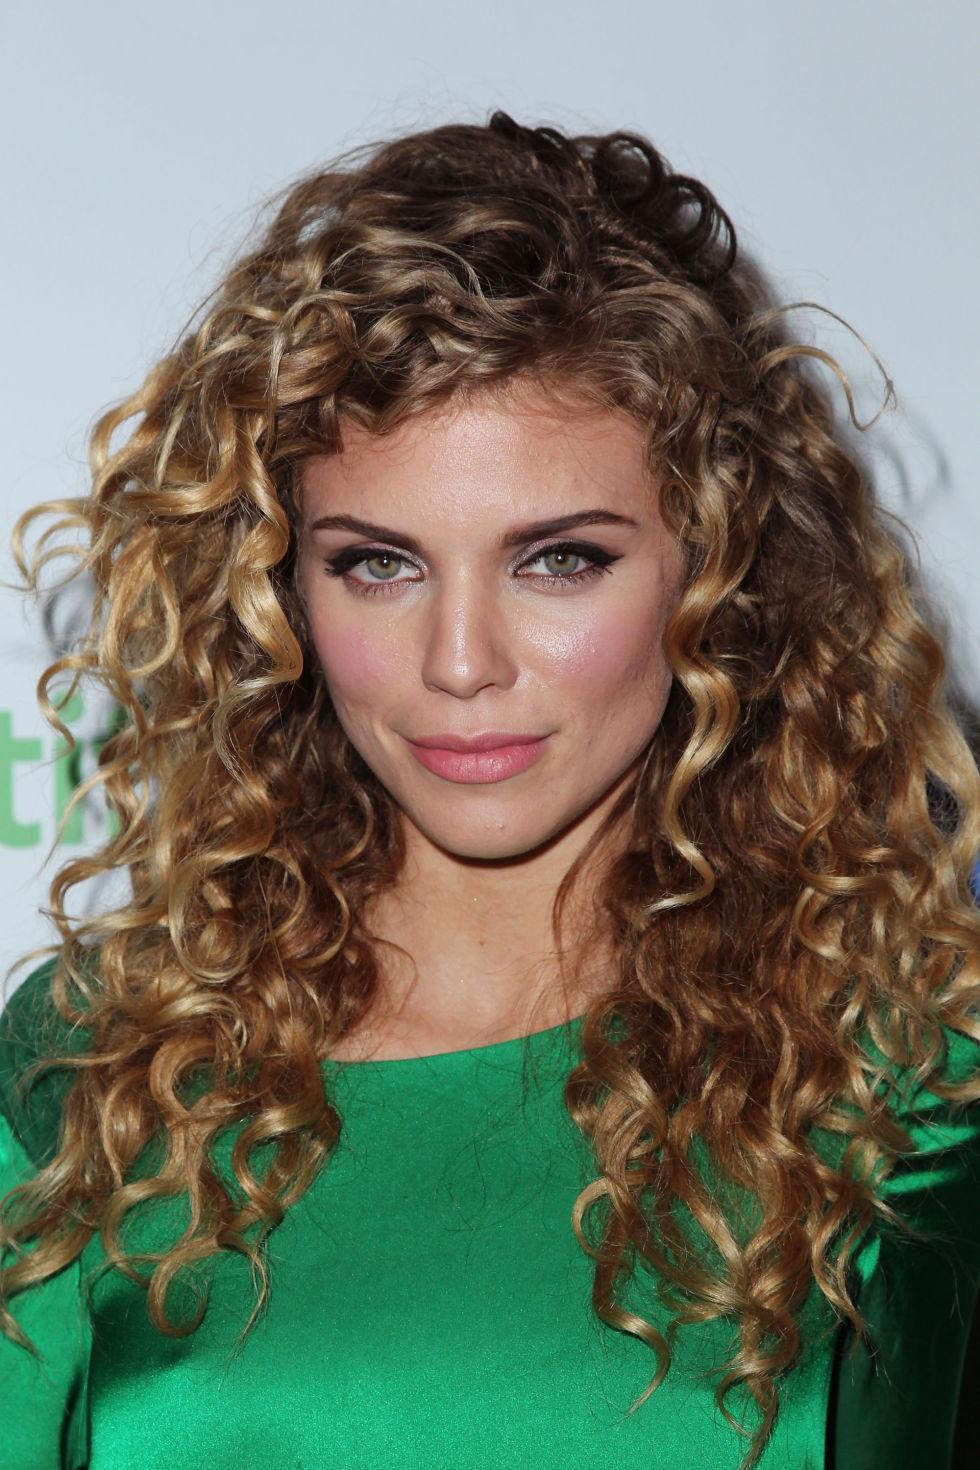 Phenomenal 30 Best Curly Hairstyles Of 2017 Cute Hairstyles For Curly Hair Short Hairstyles For Black Women Fulllsitofus